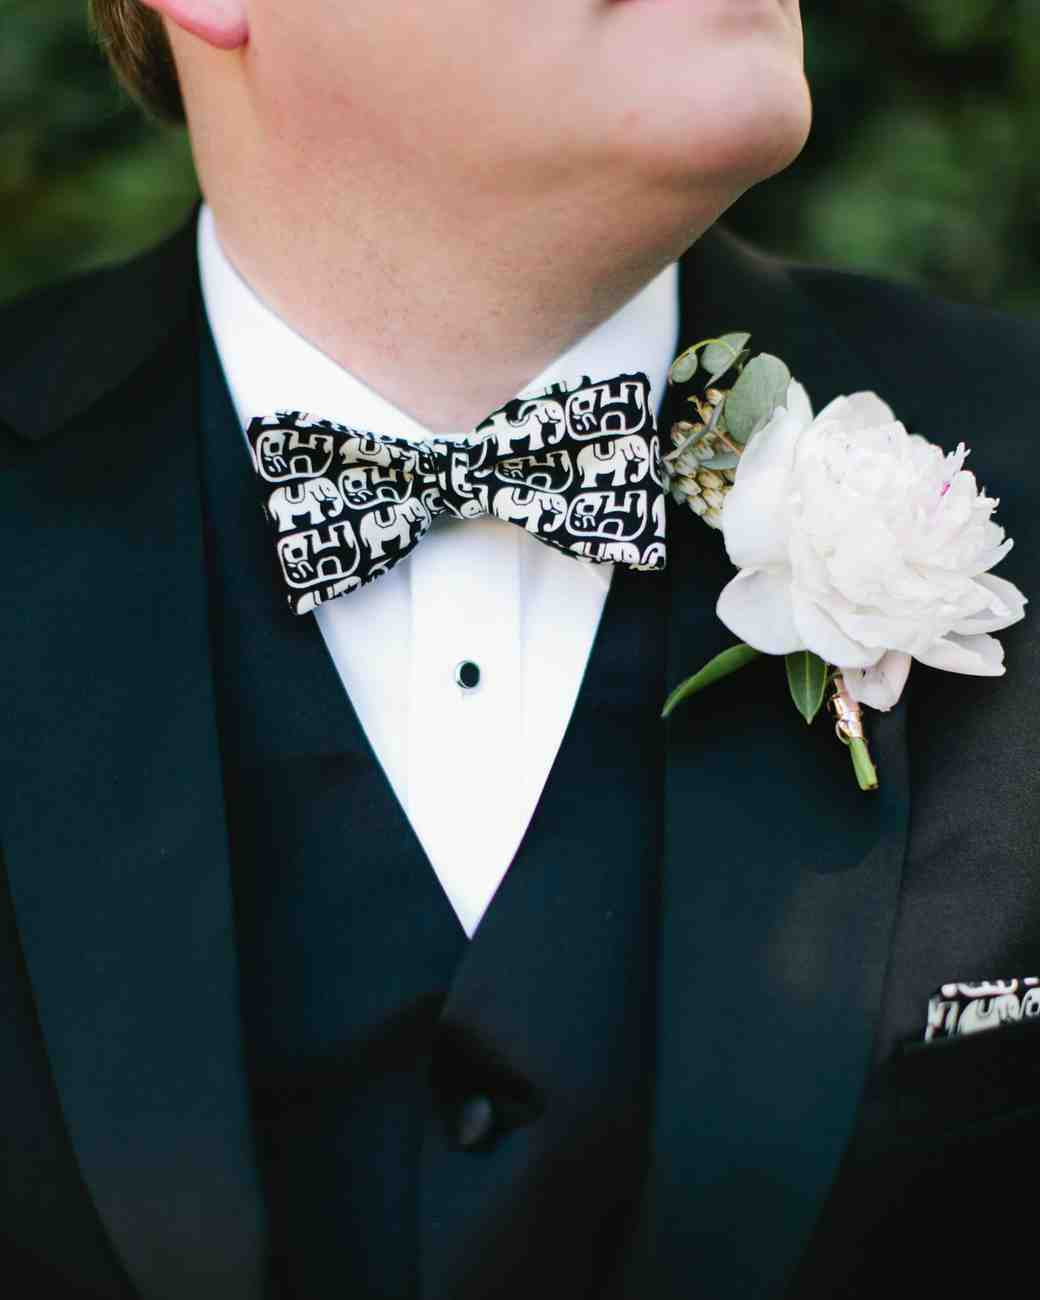 holly-john-wedding-texas-boutonniere-bowtie-034-s112833-0516.jpg